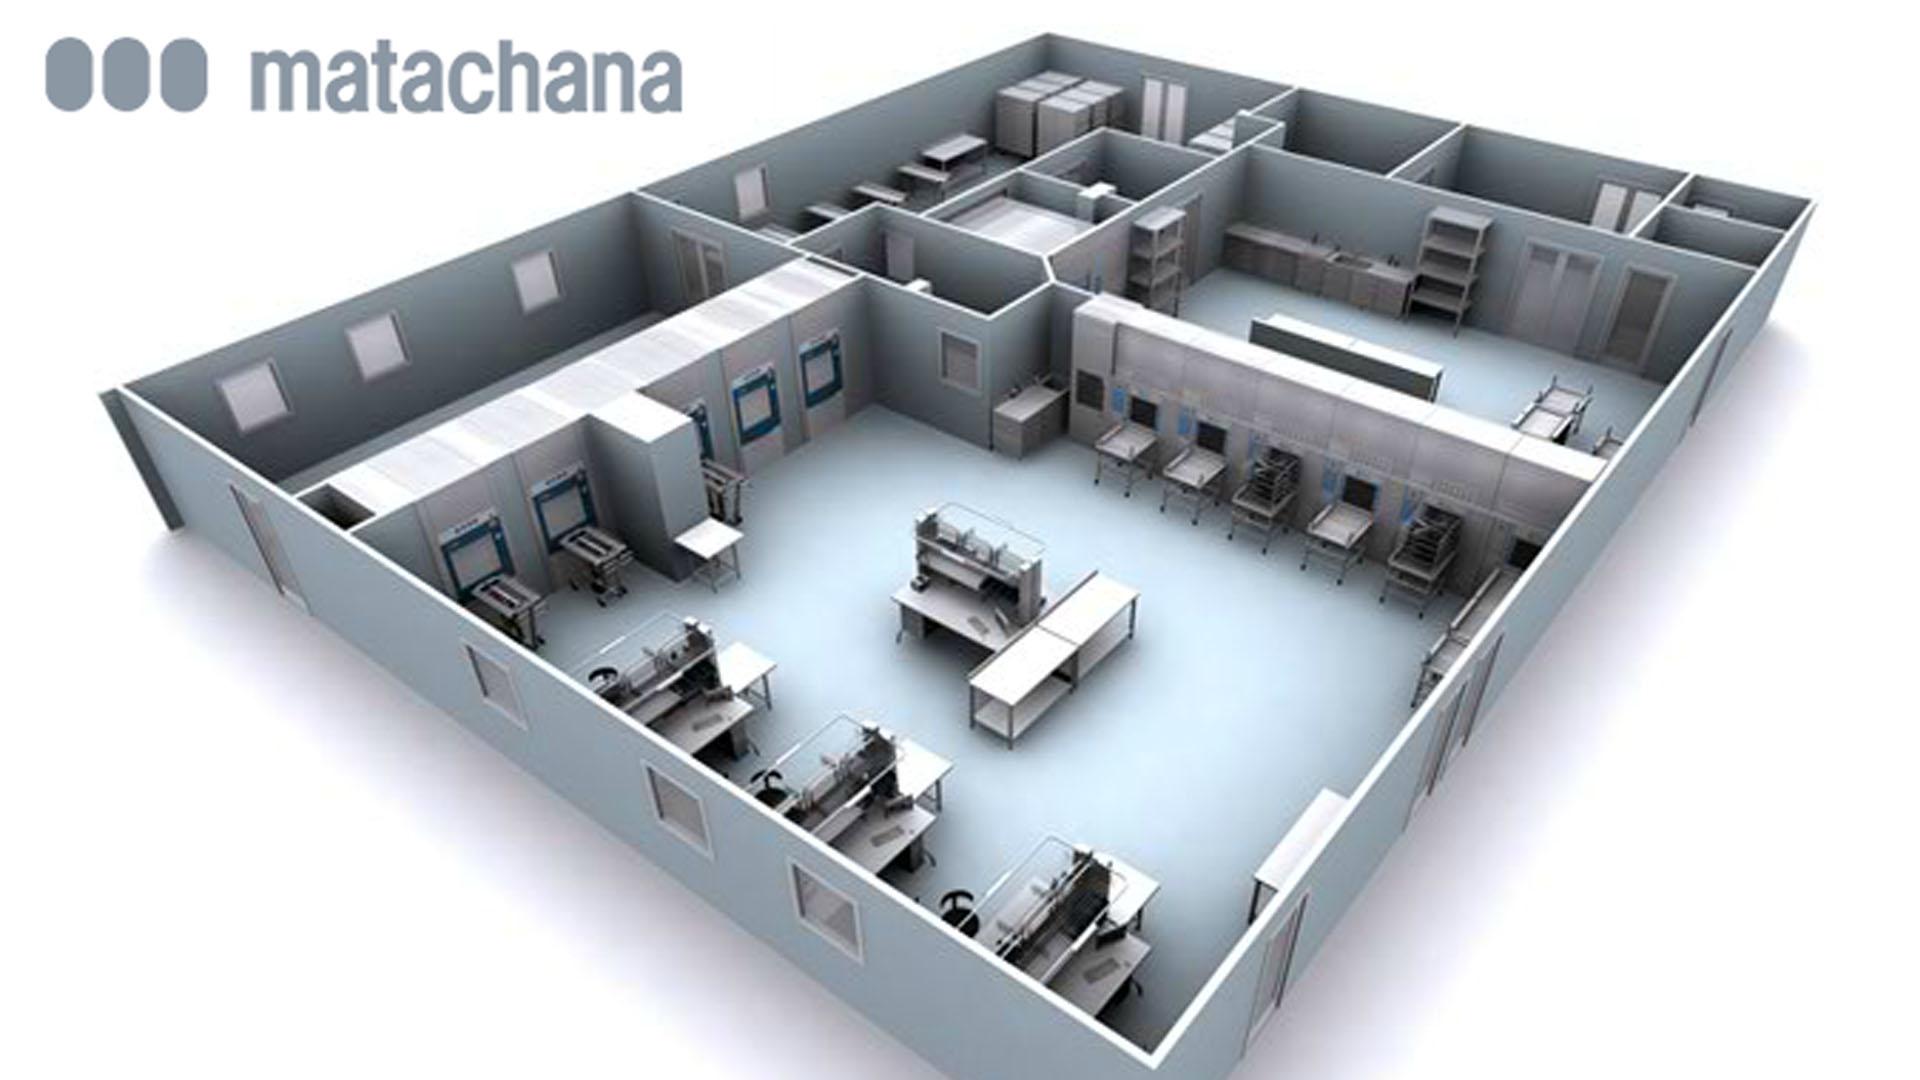 The Matachana Group